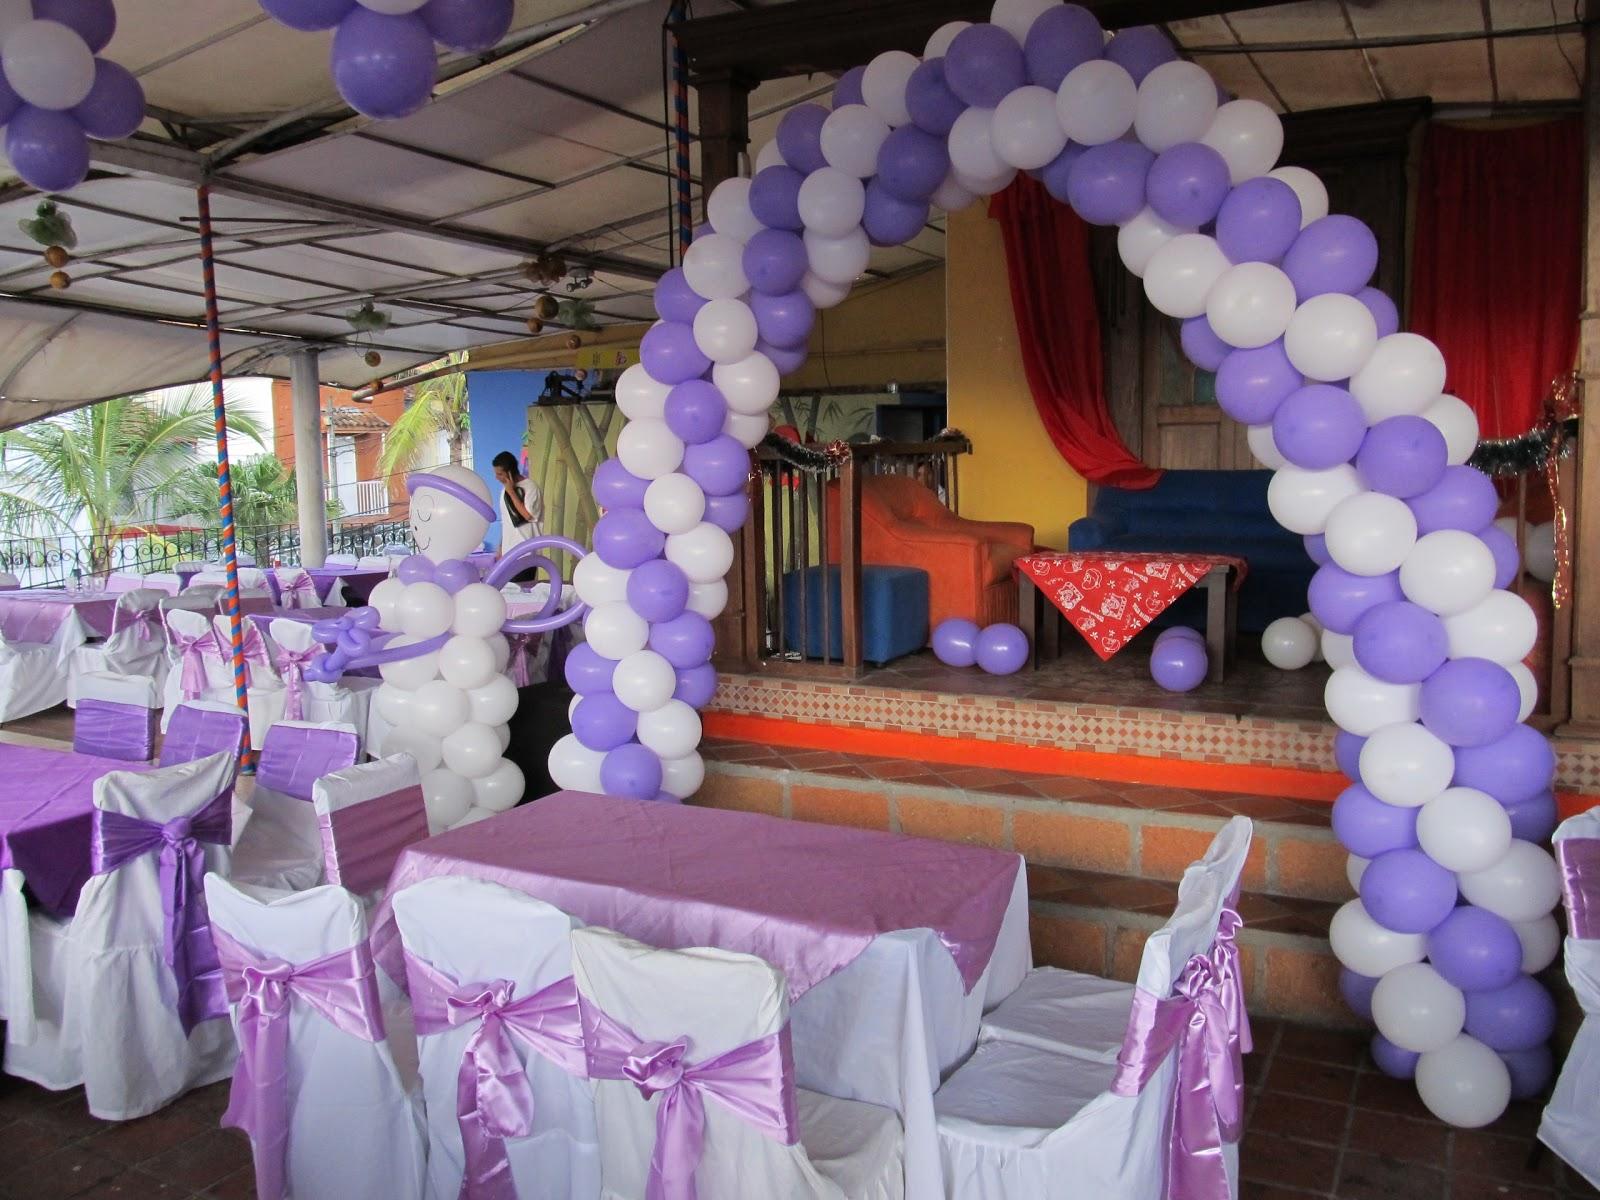 Decoracion para comunion con globos / Senderismo gps